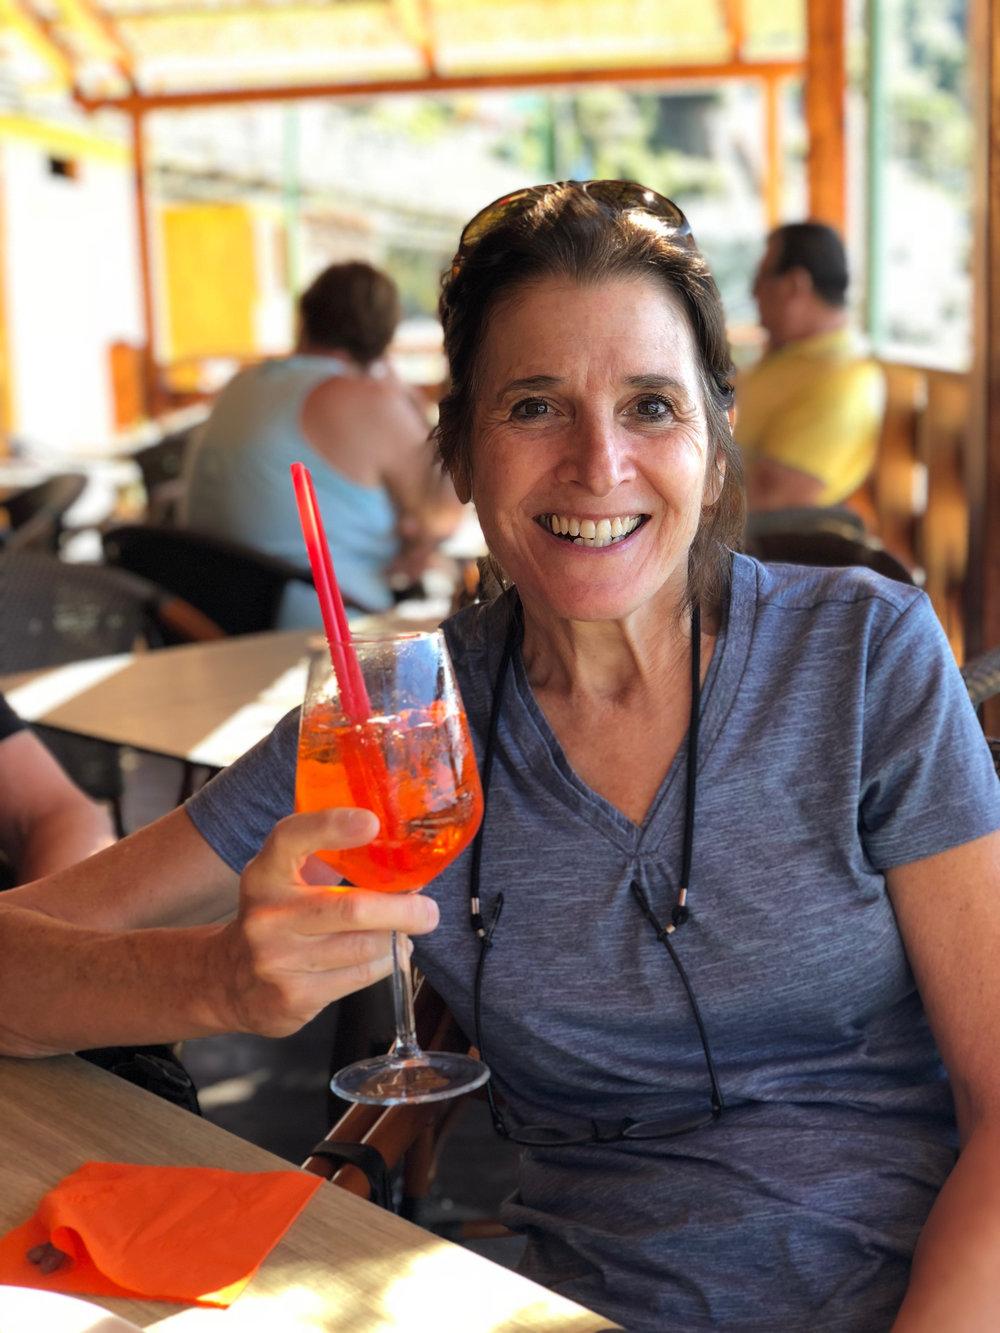 jo rewards herself with a spritz after biking along the ligurian coast